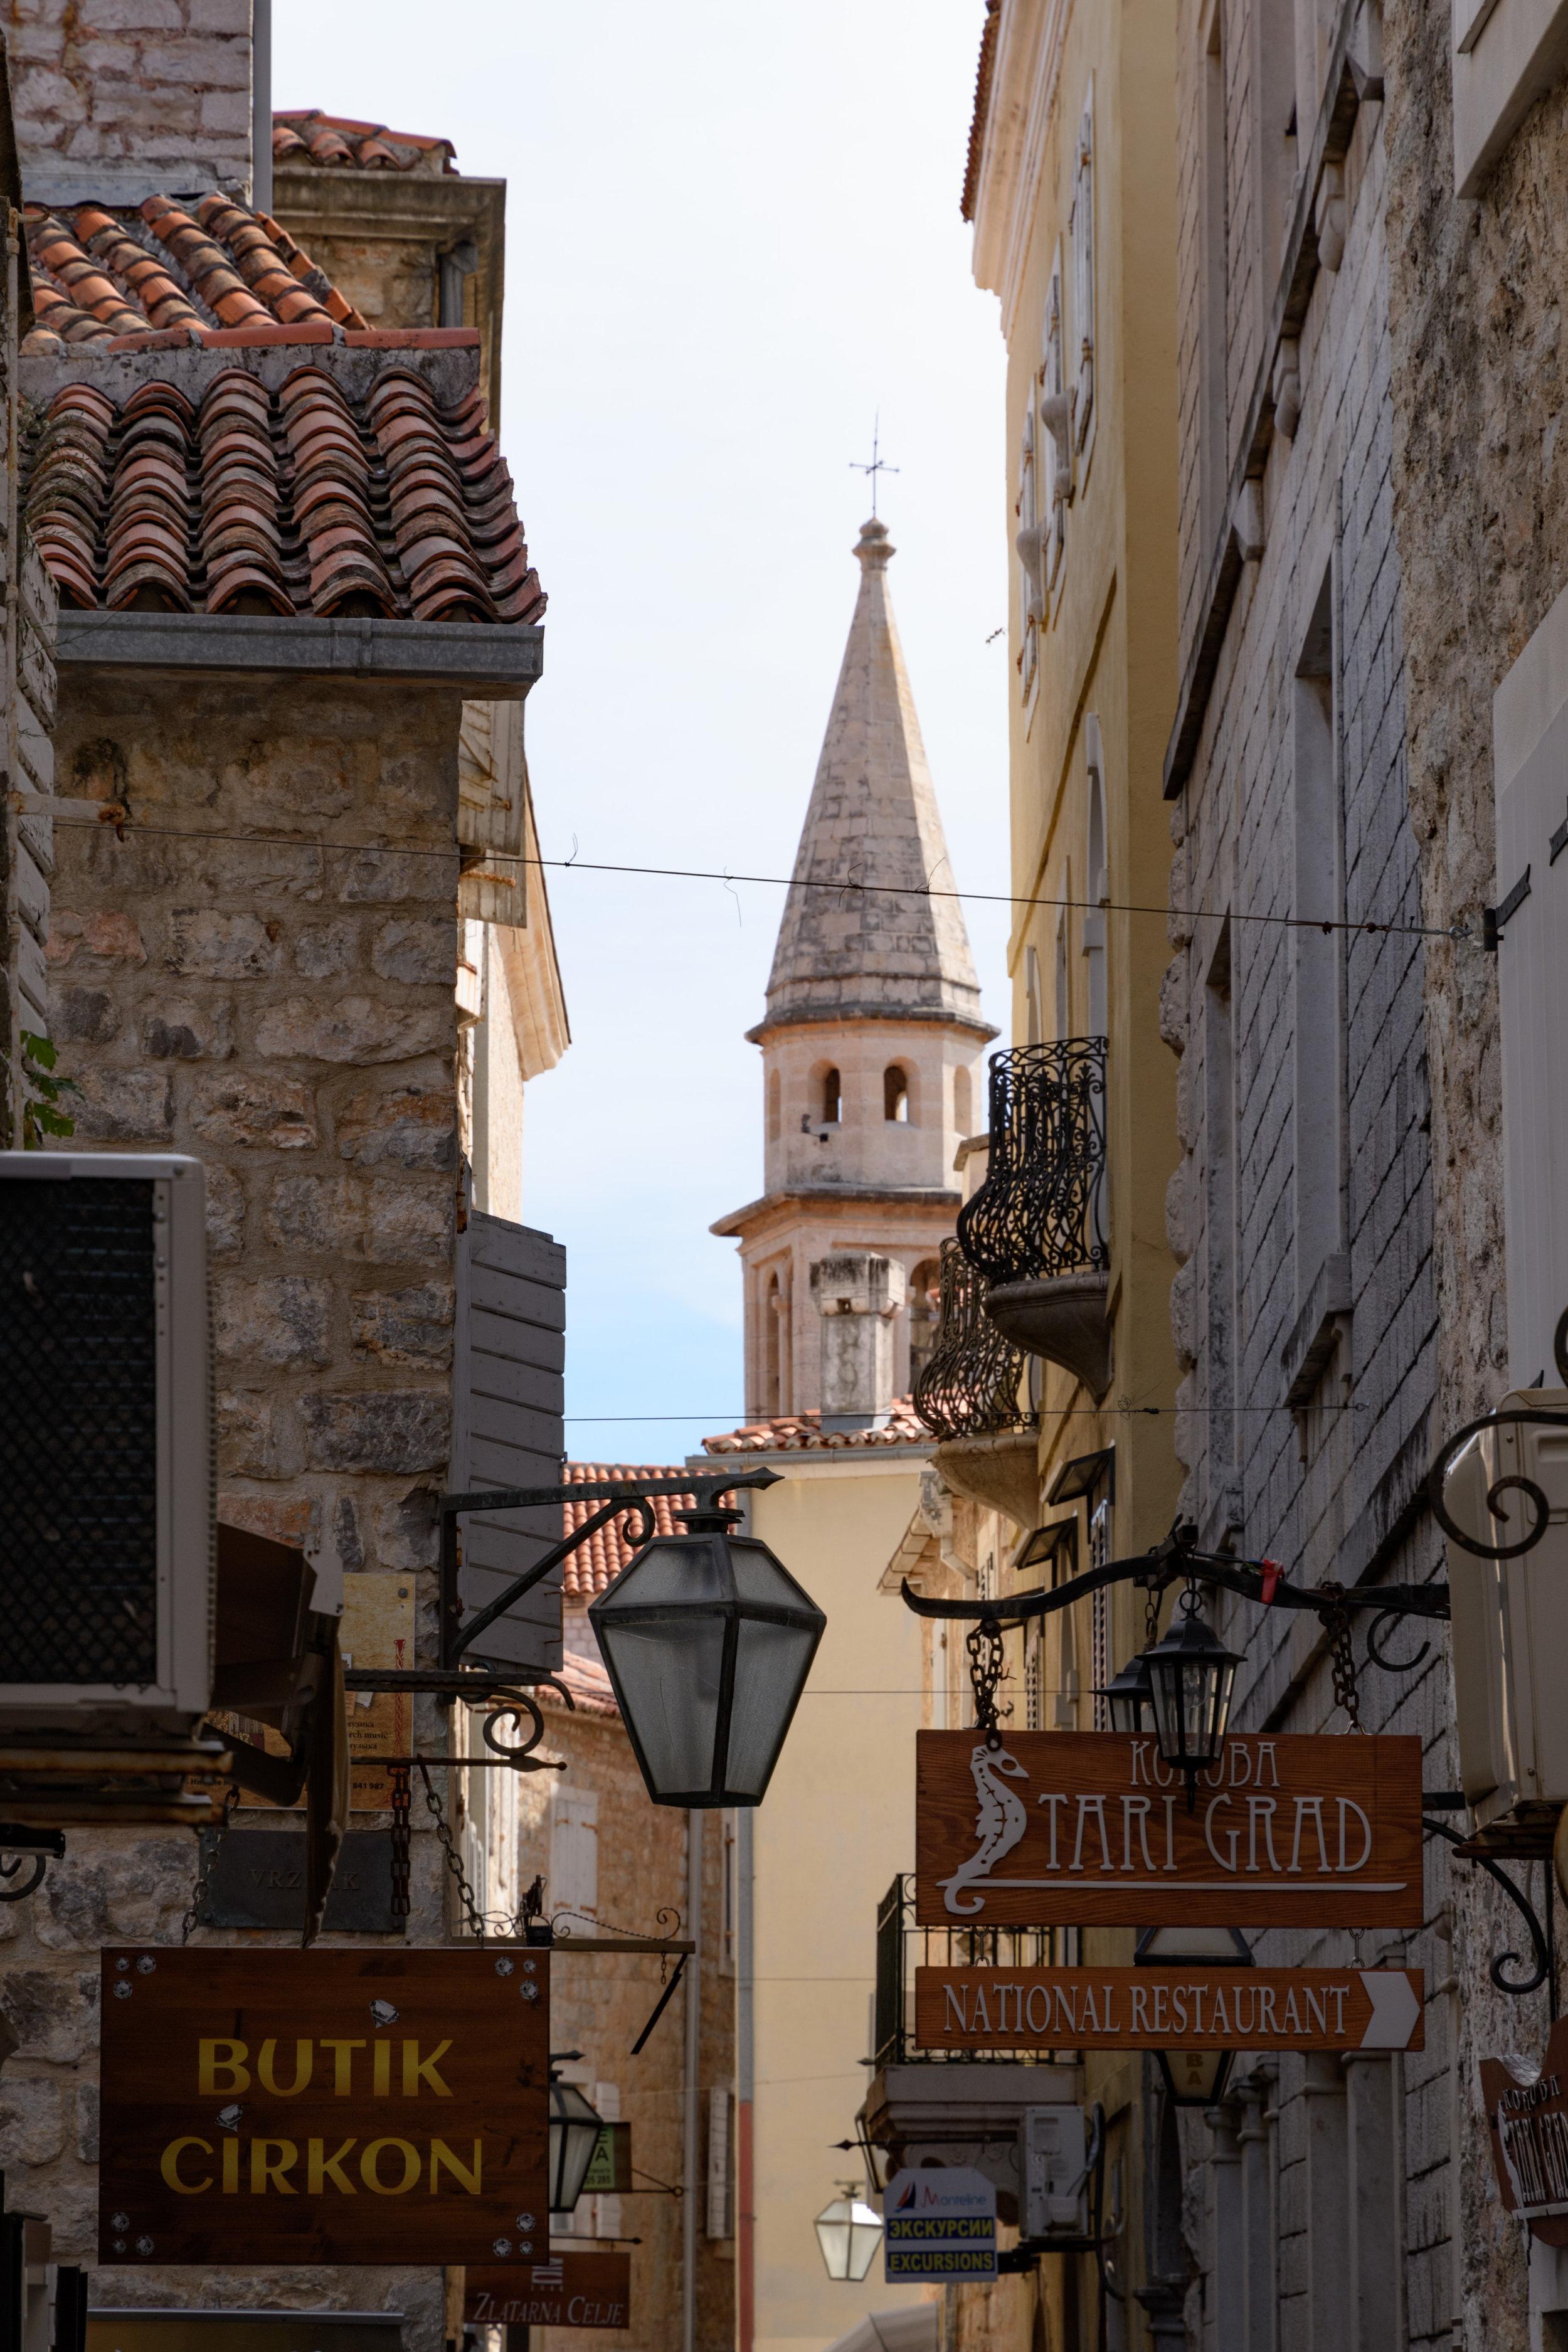 The Stari Grad (Old Town) of Budva